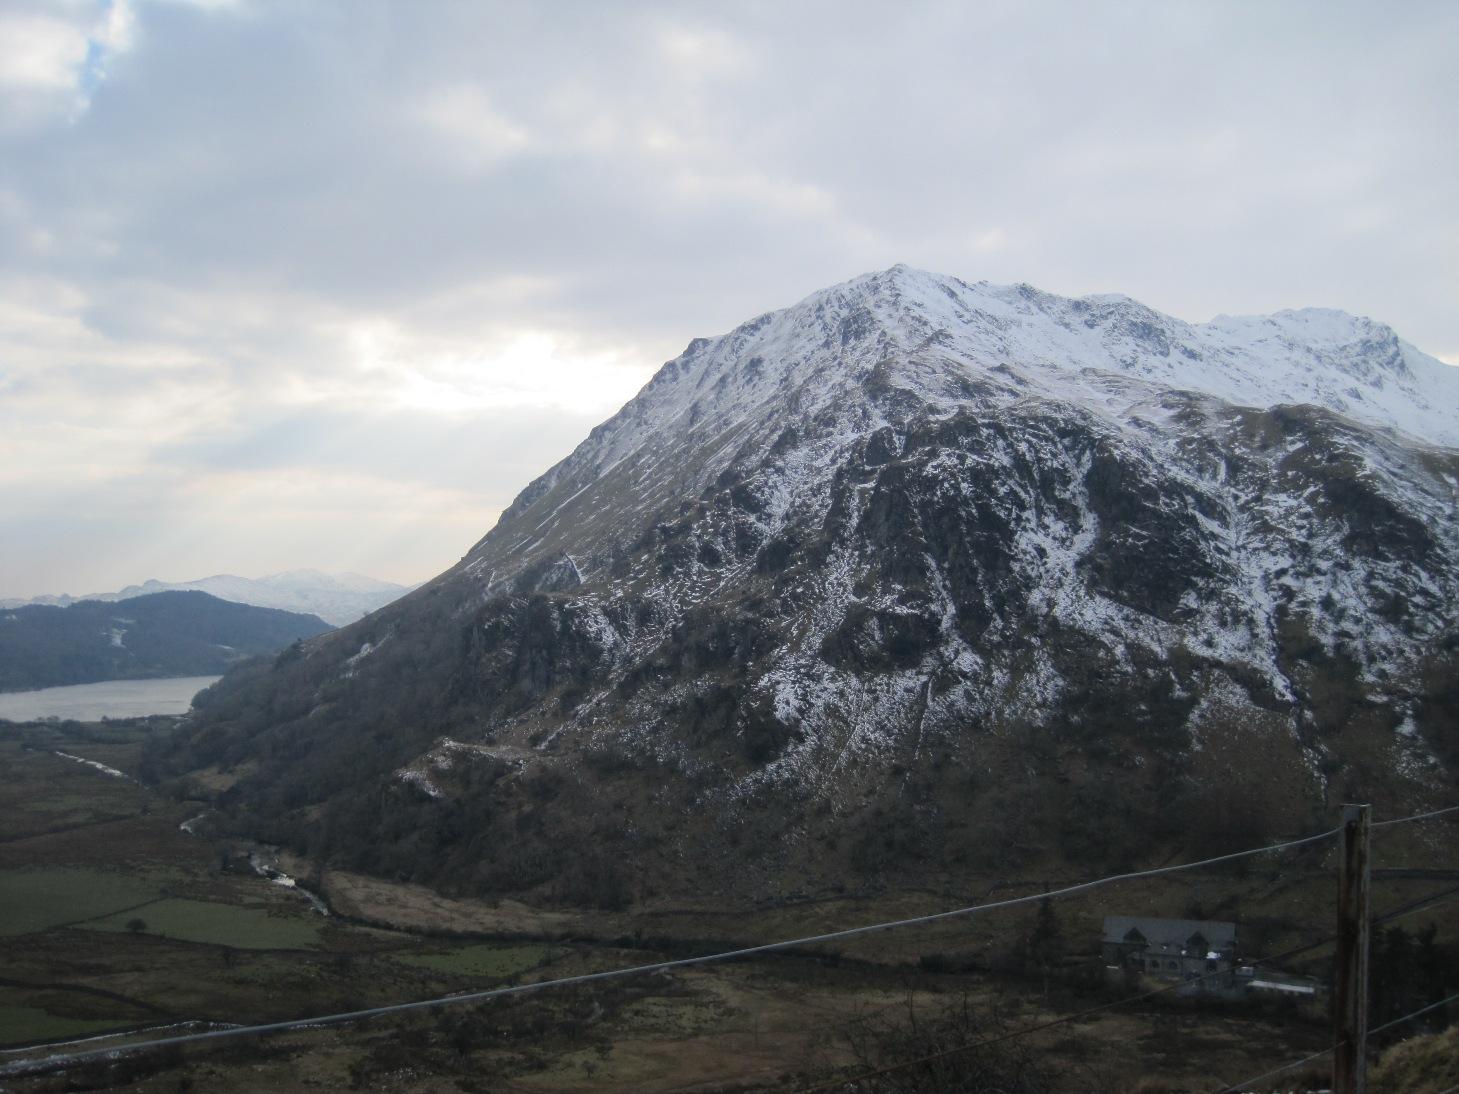 Snowdonia 28 Mar 2013 (176)